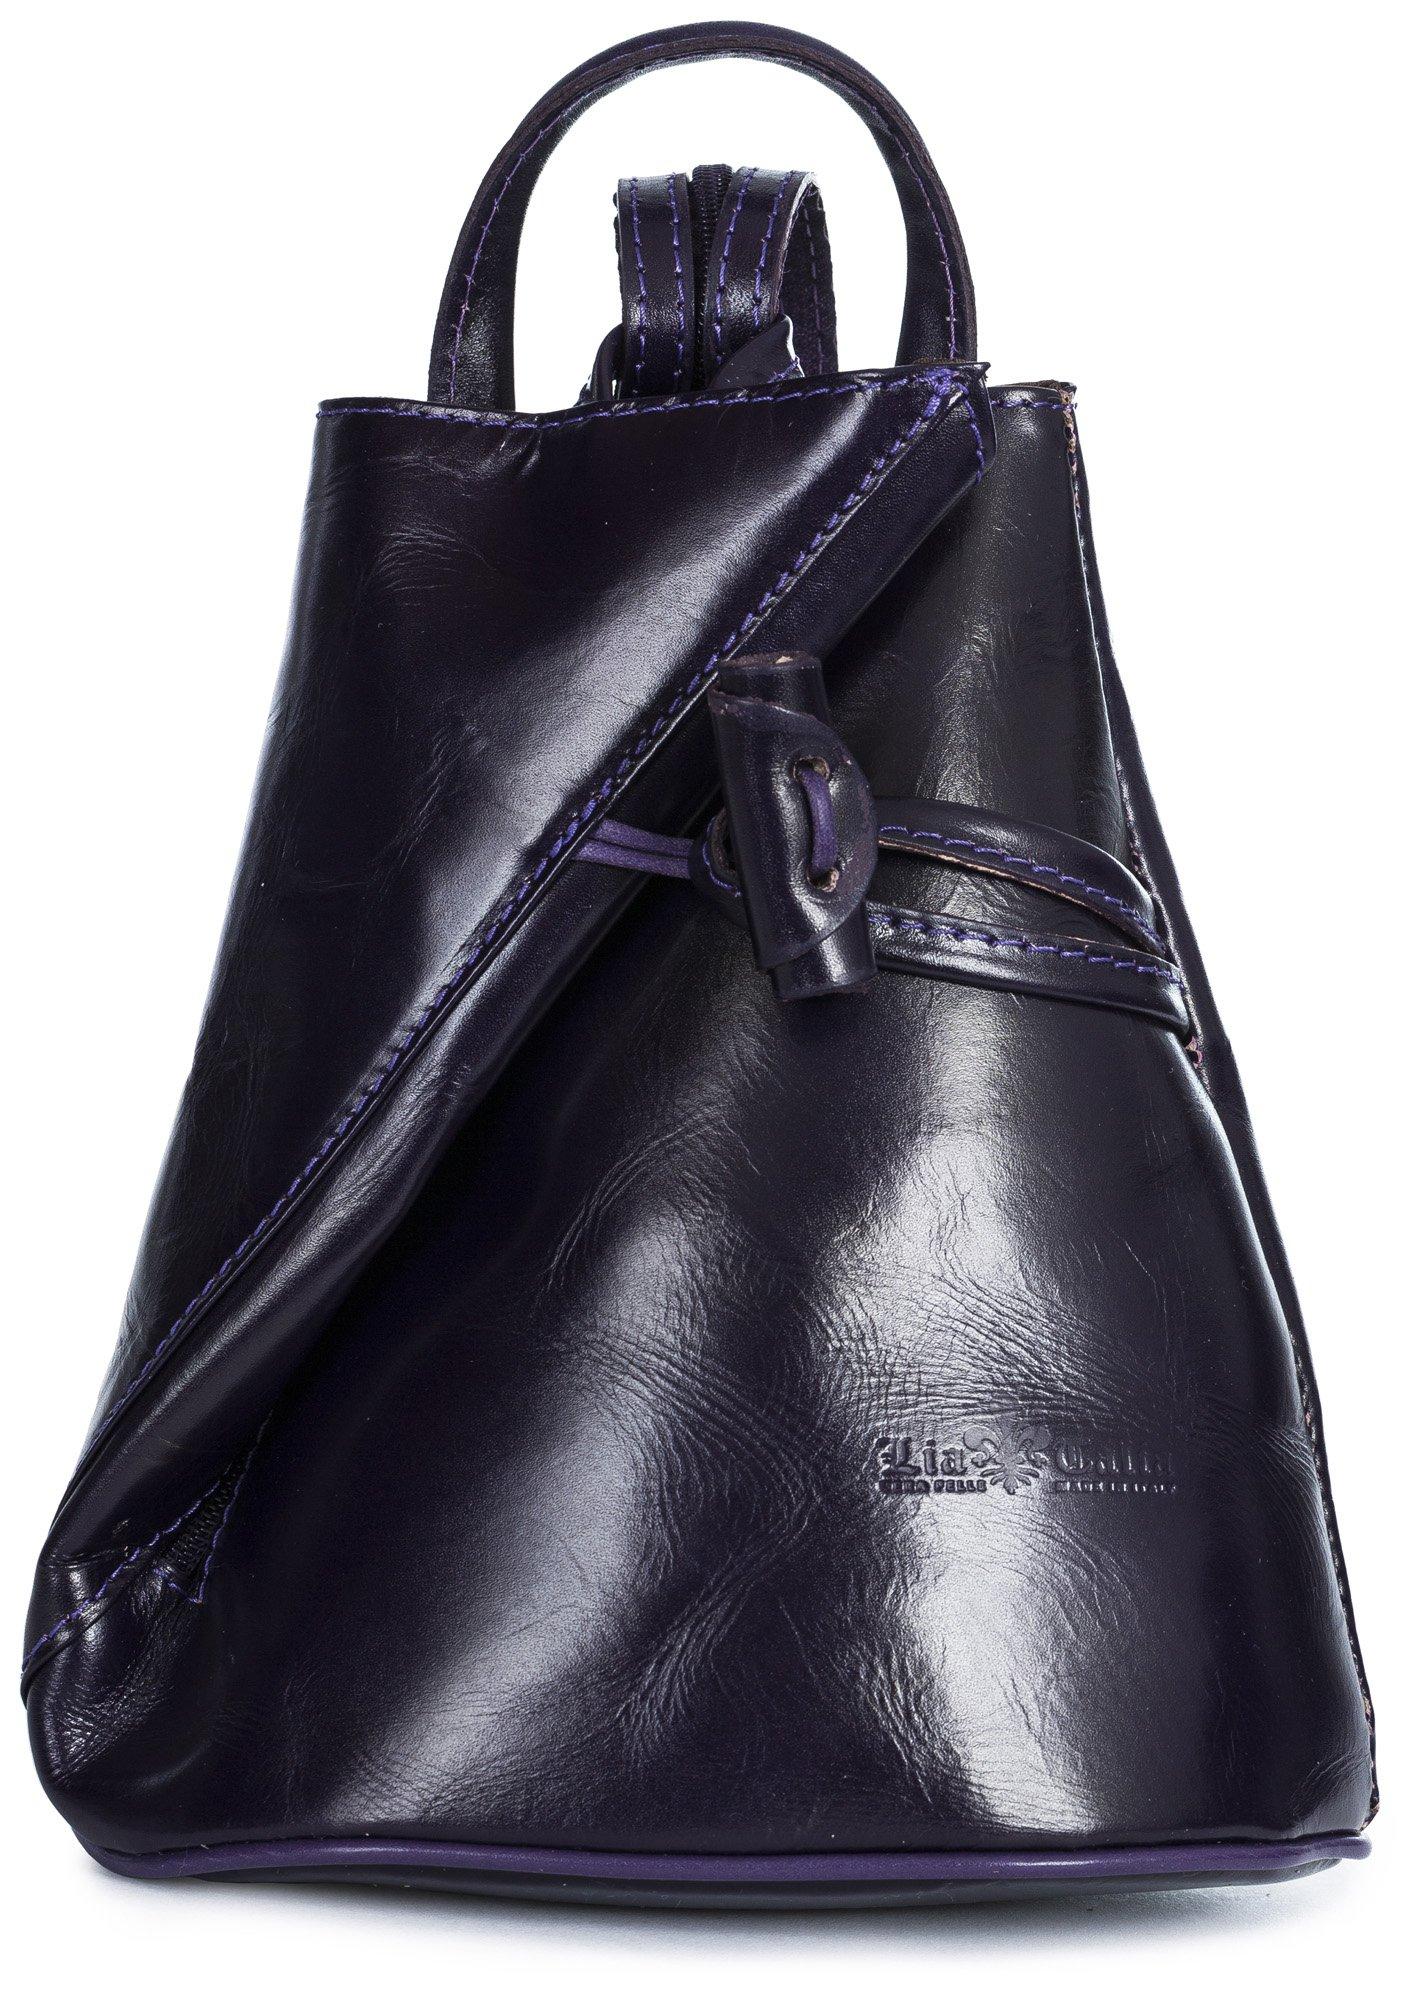 LiaTalia Convertible Strap Italian Leather Backpack Shoulder Bag with Protective Storage Bag - Brady (Large - Purple Plain)